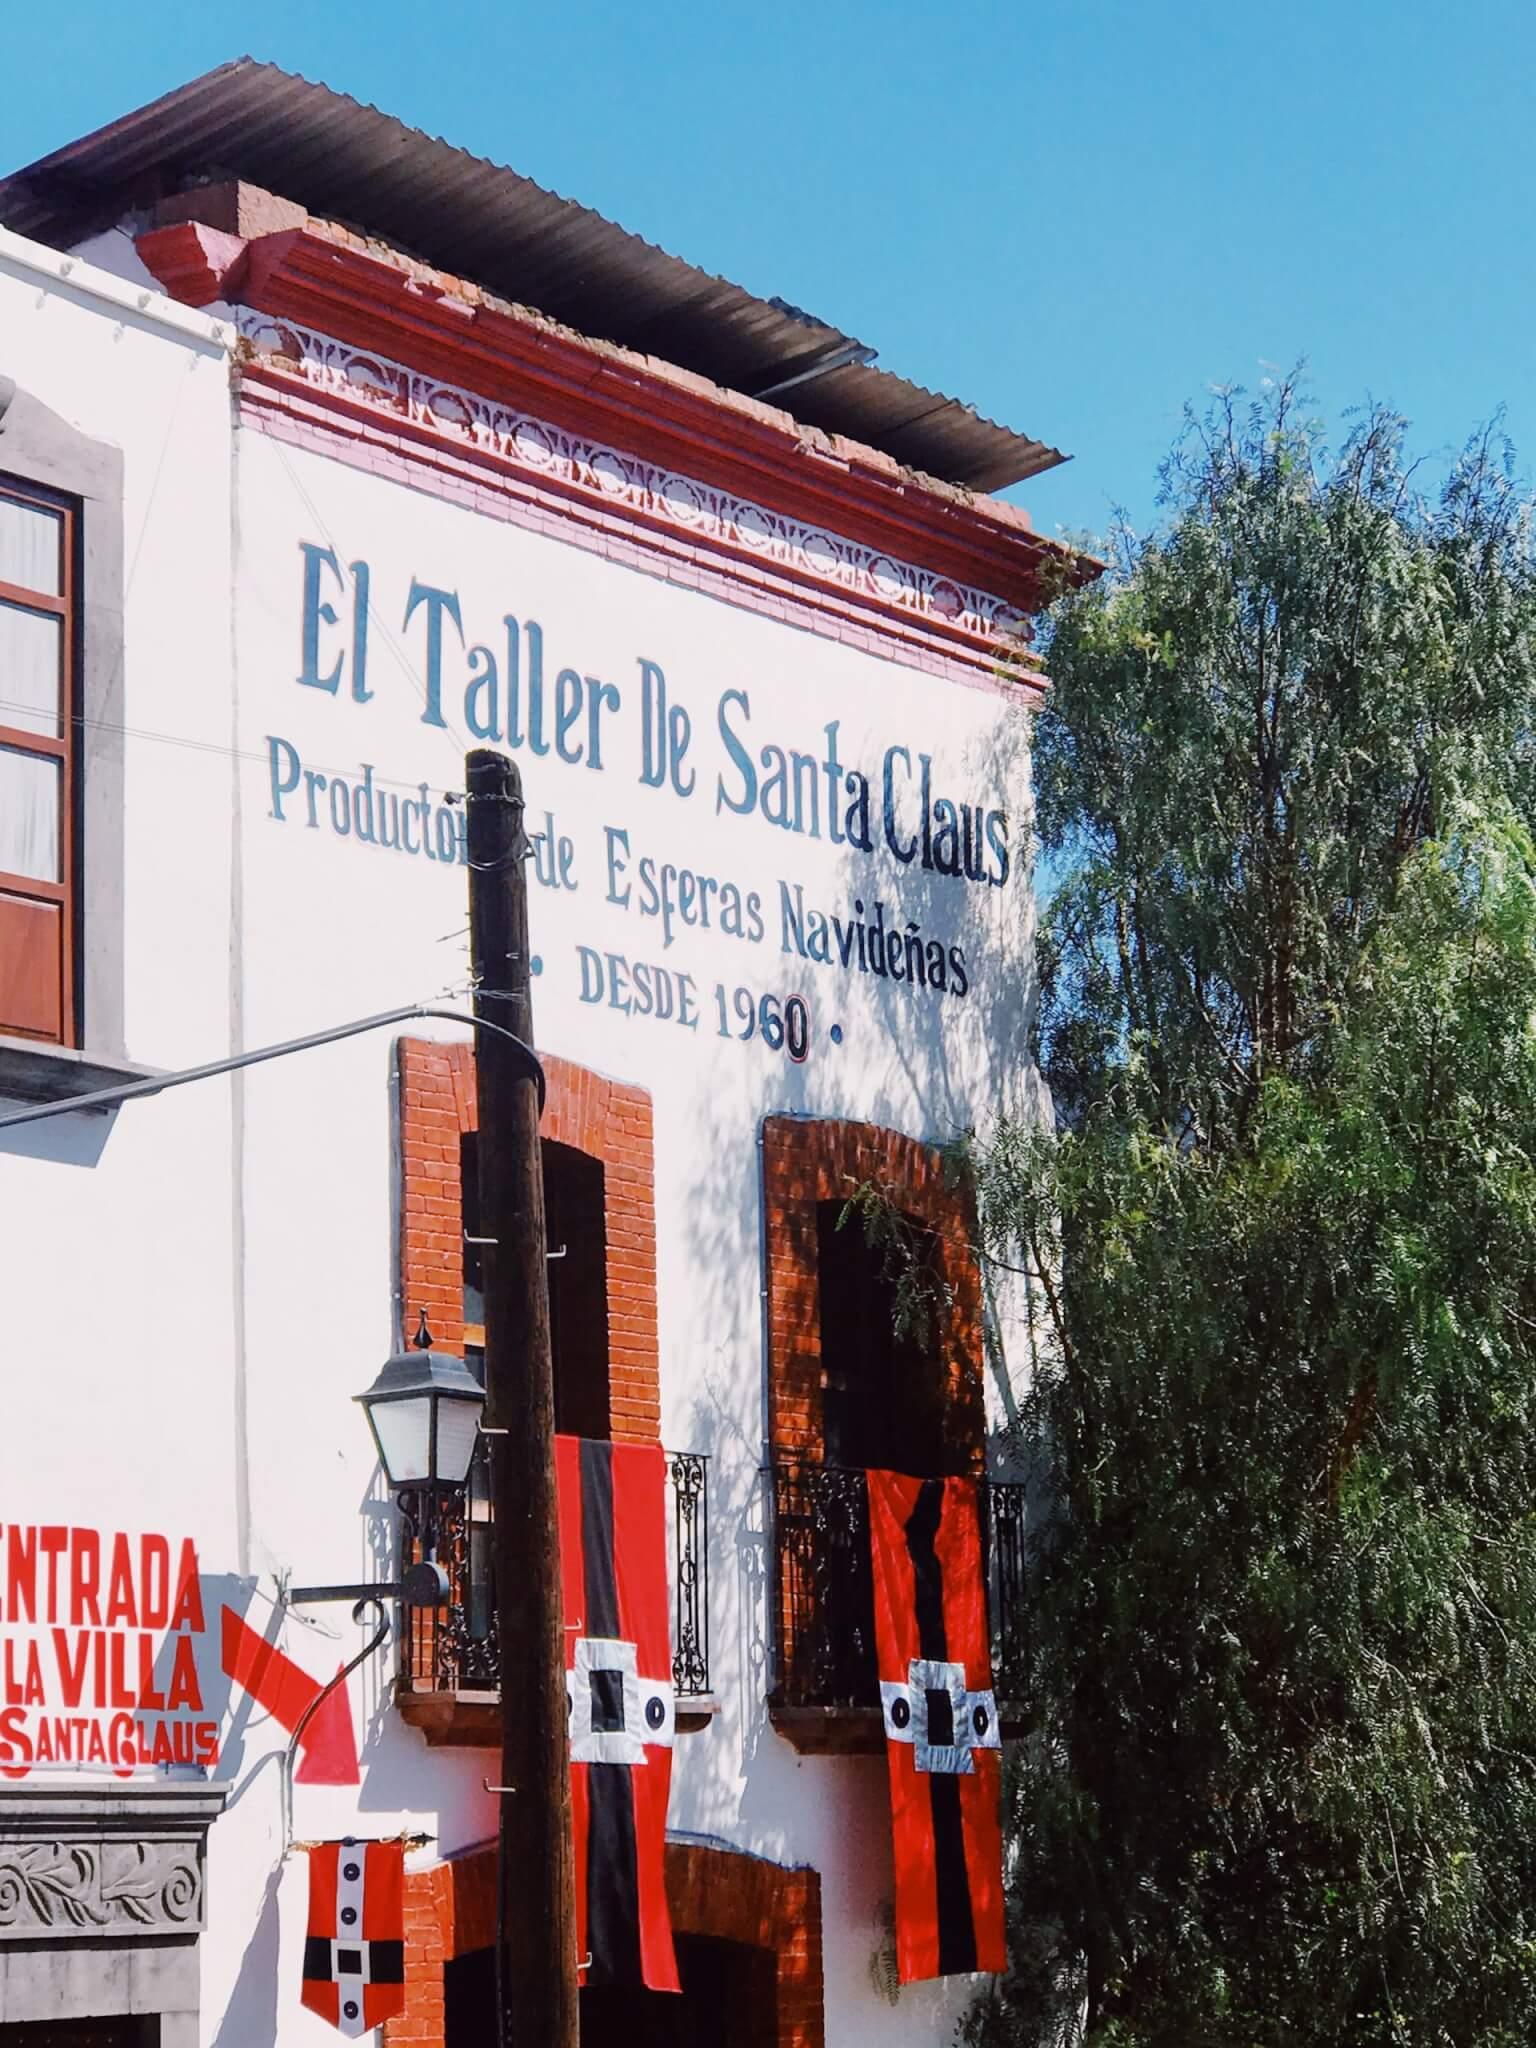 Tlapujahua Michoacán: One of Mexico's Most Christmassy Pueblos Magicos